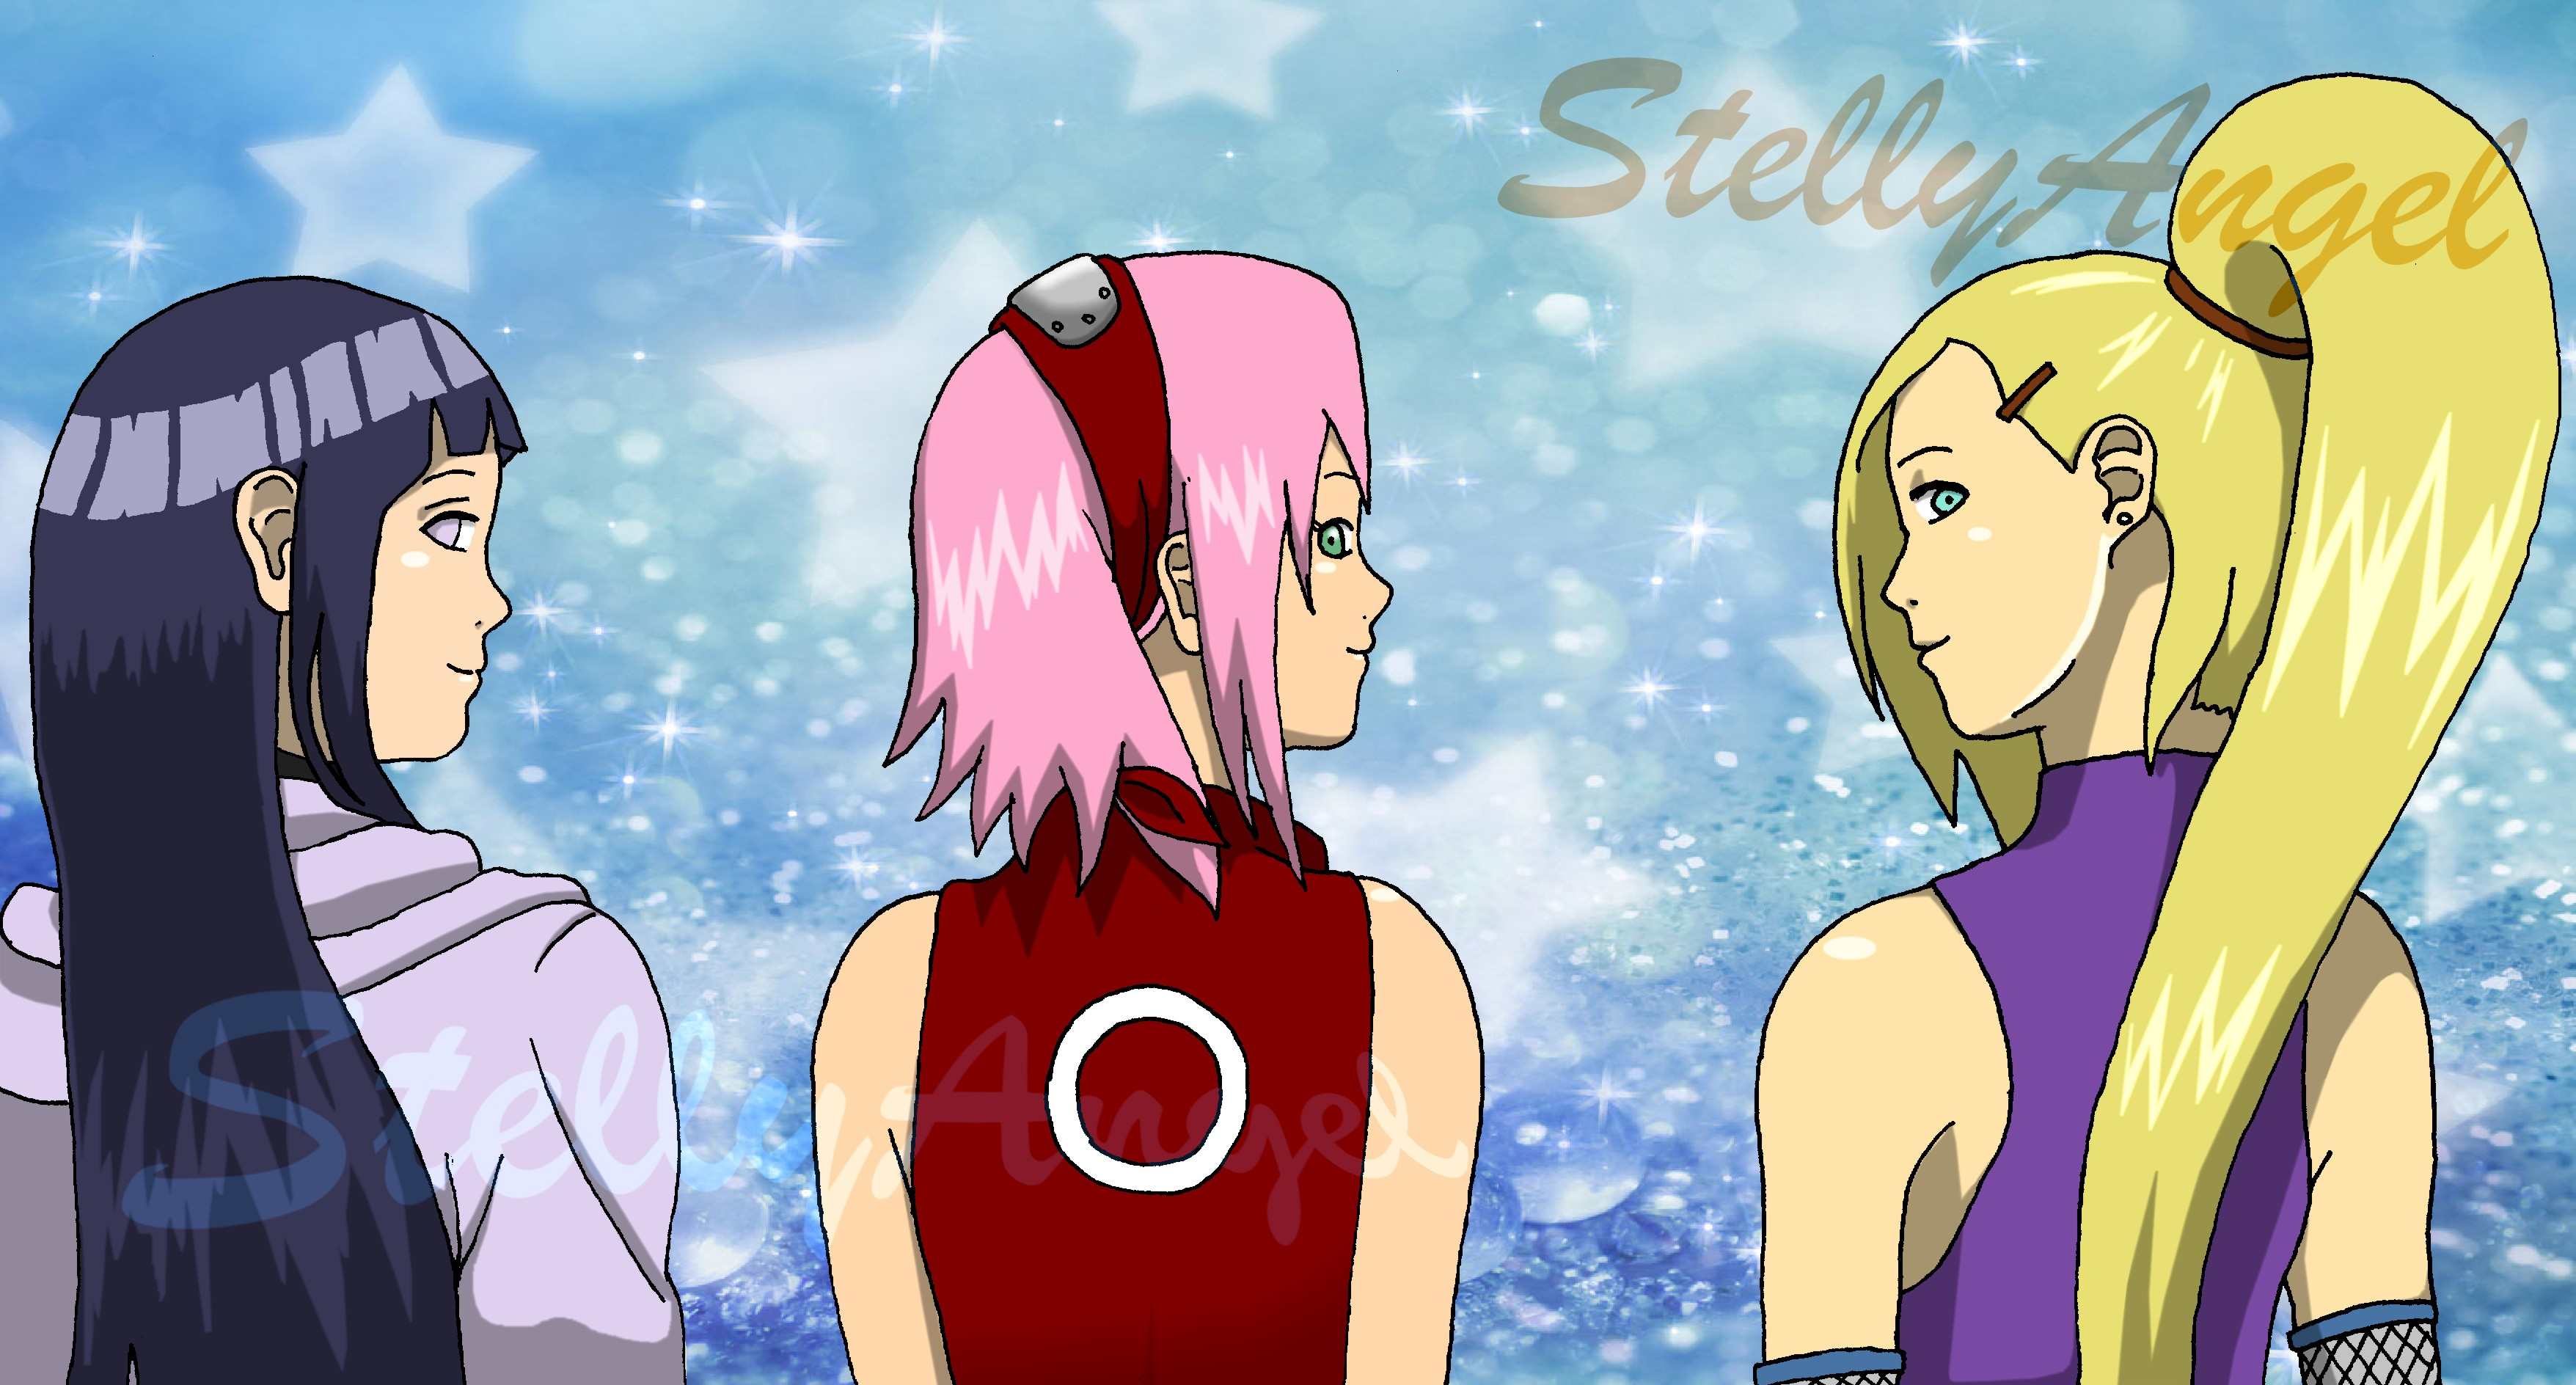 Sakura Ino Images  FemaleCelebrity